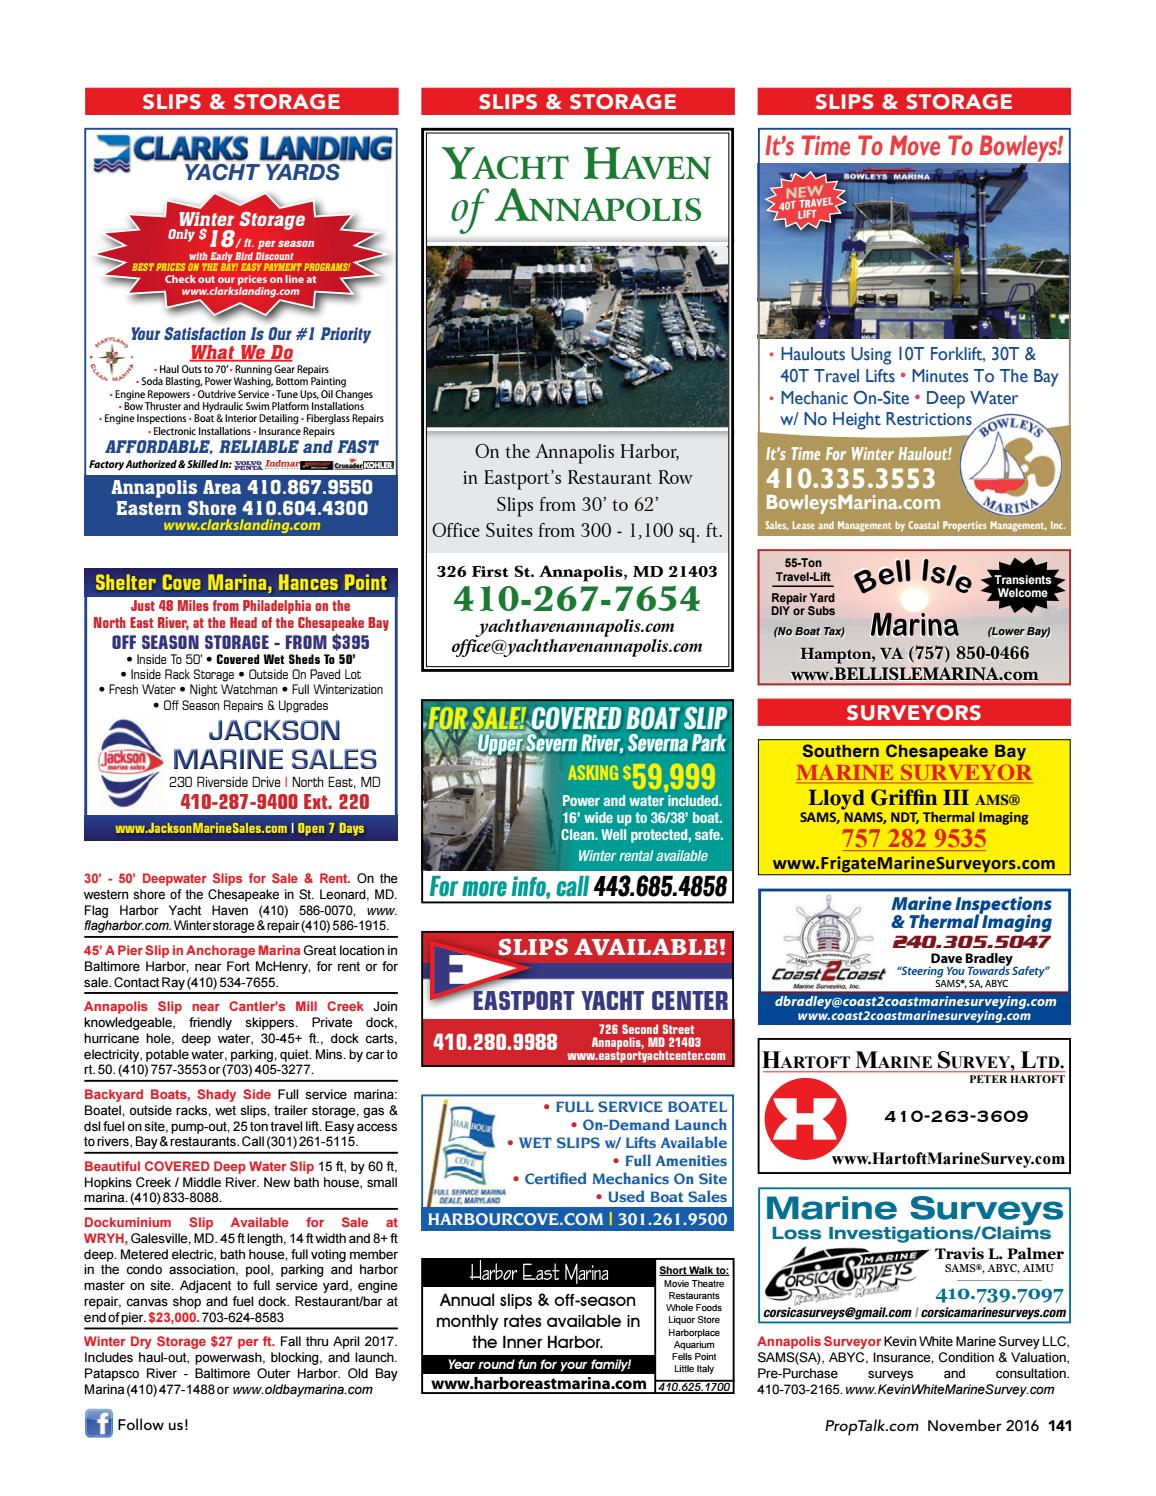 proptalk magazine november 2016 by spinsheet publishing company